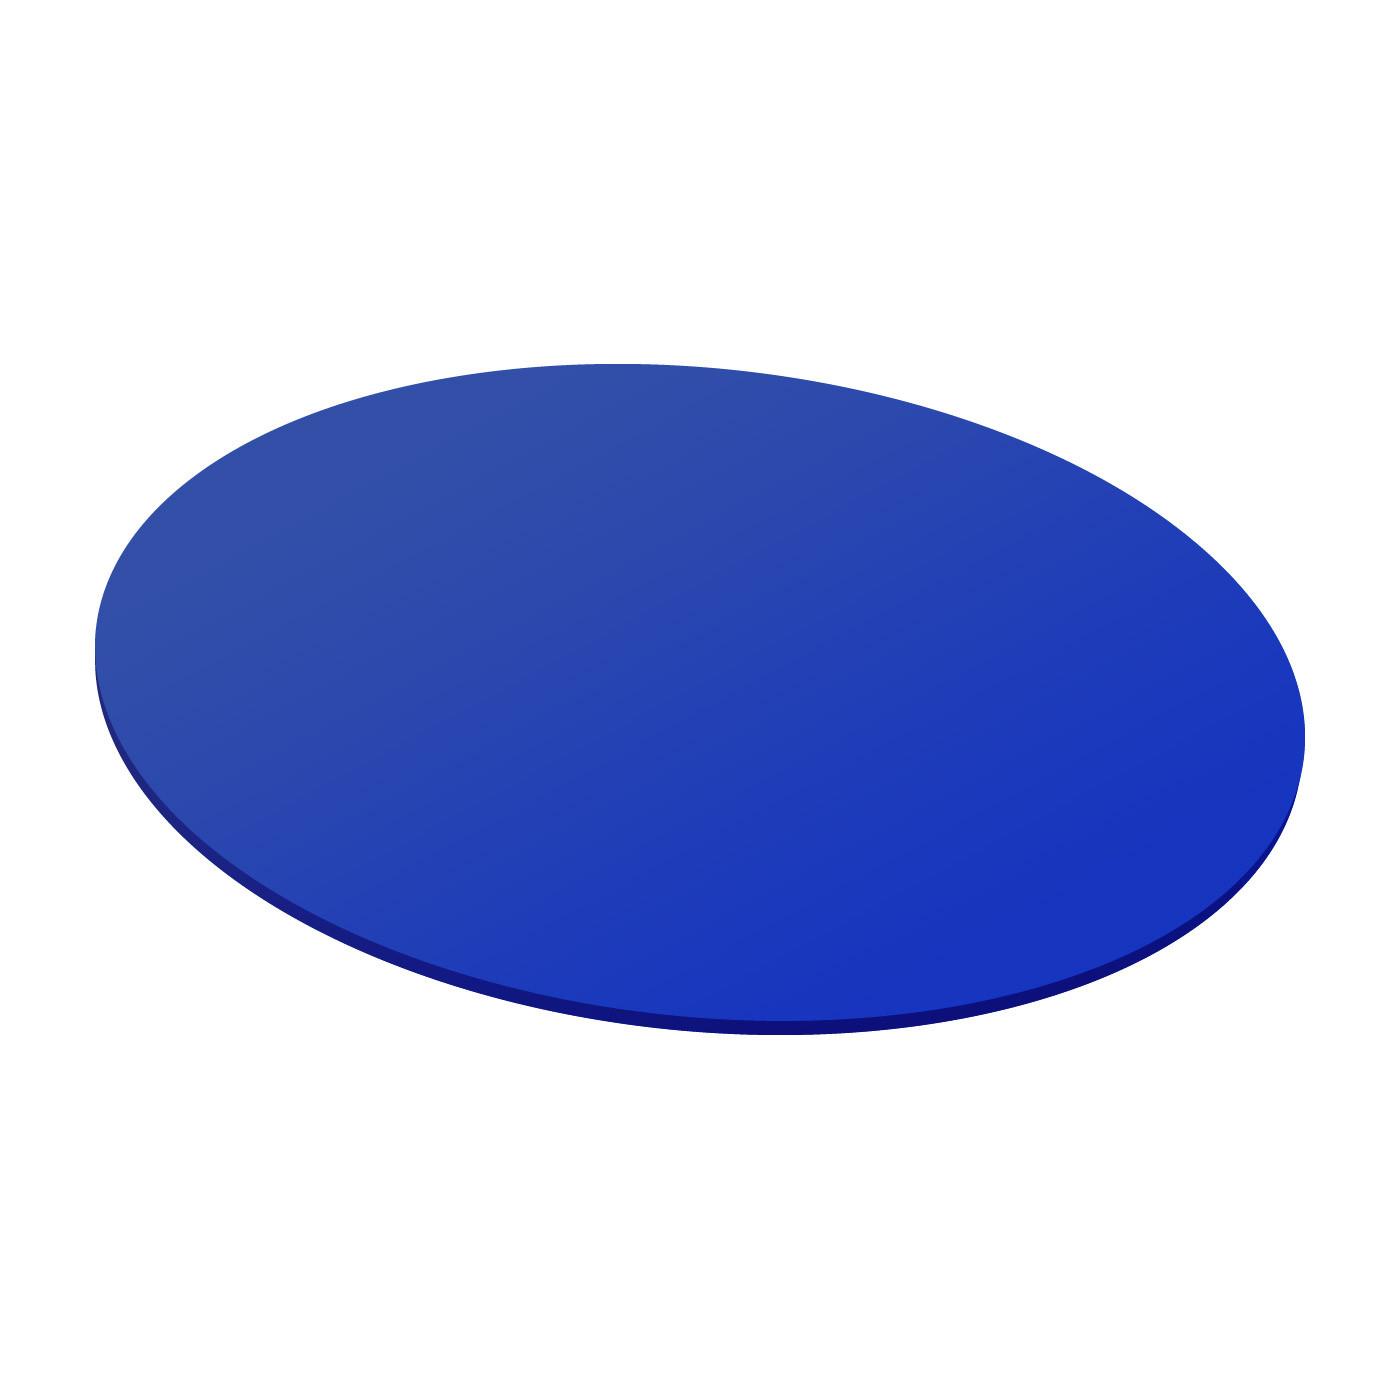 Cini & Nils Componi 75 disco Scheibe dichroitisch blau